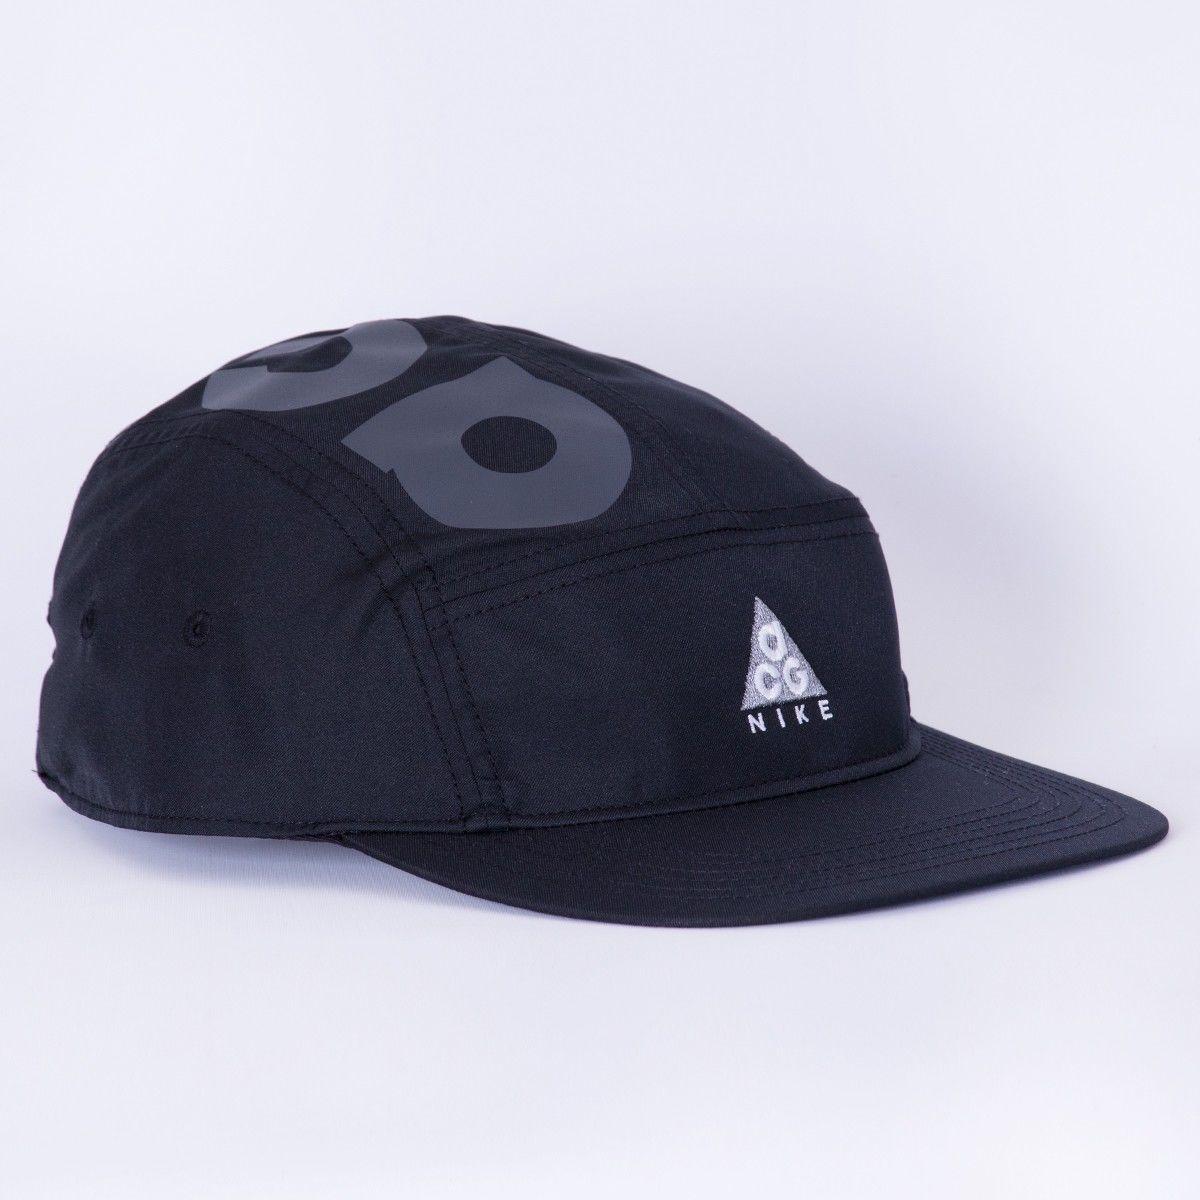 b6510df6 Very Goods | Nike NSW ACG Dry AW84 Cap QS Black/Black